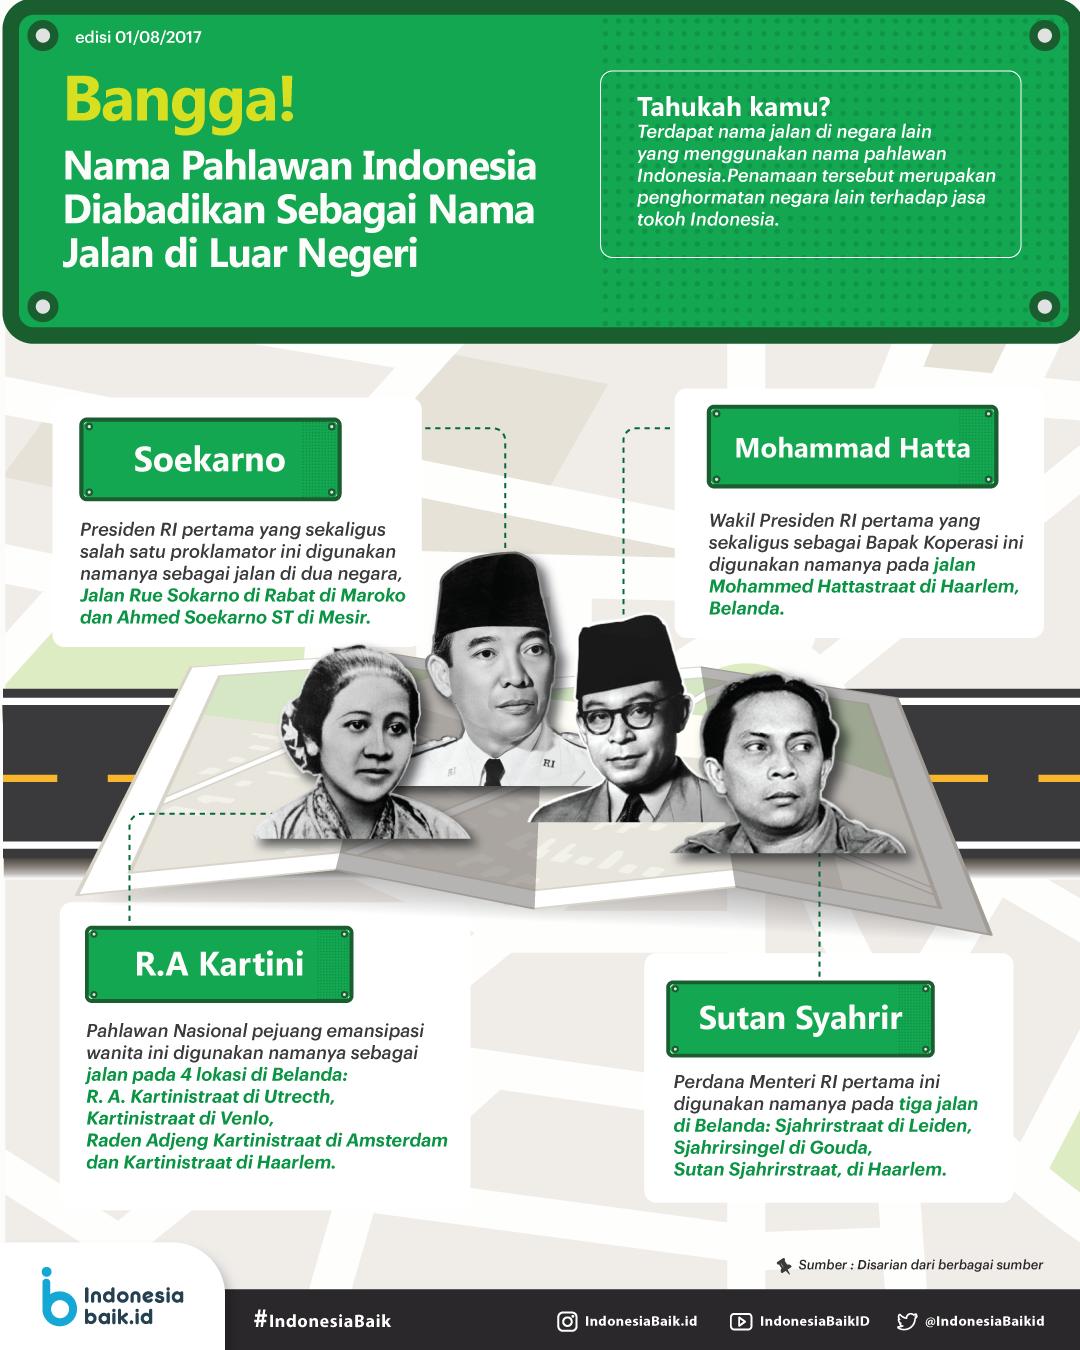 Bangga! Nama Pahlawan Indonesia  di Jalan Luar Negeri